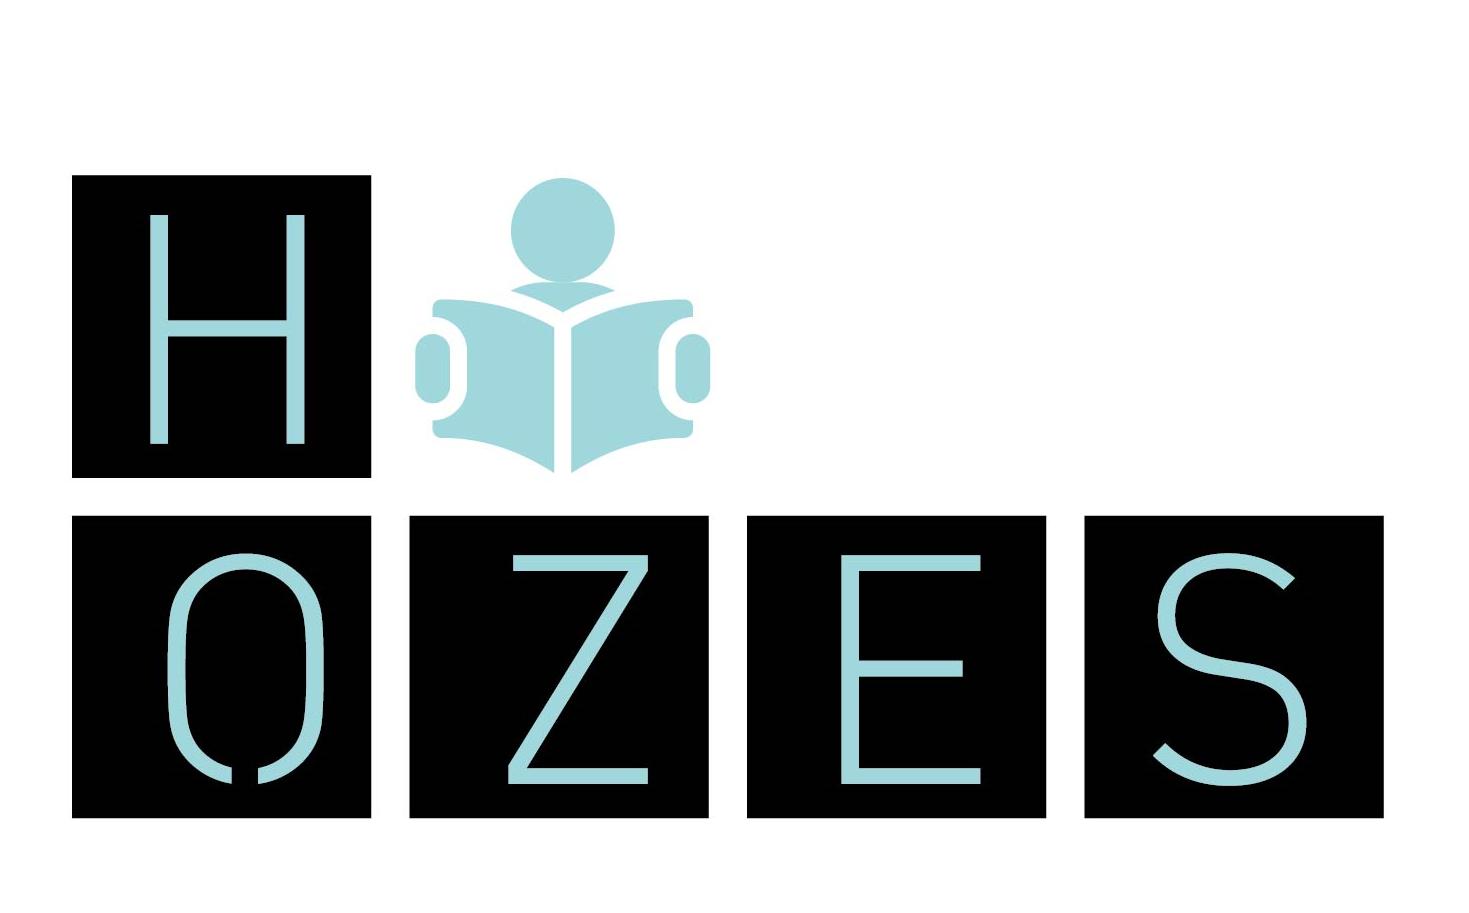 https://fondationdelislamdefrance.fr/wp-content/uploads/2019/05/hozes-logo.png